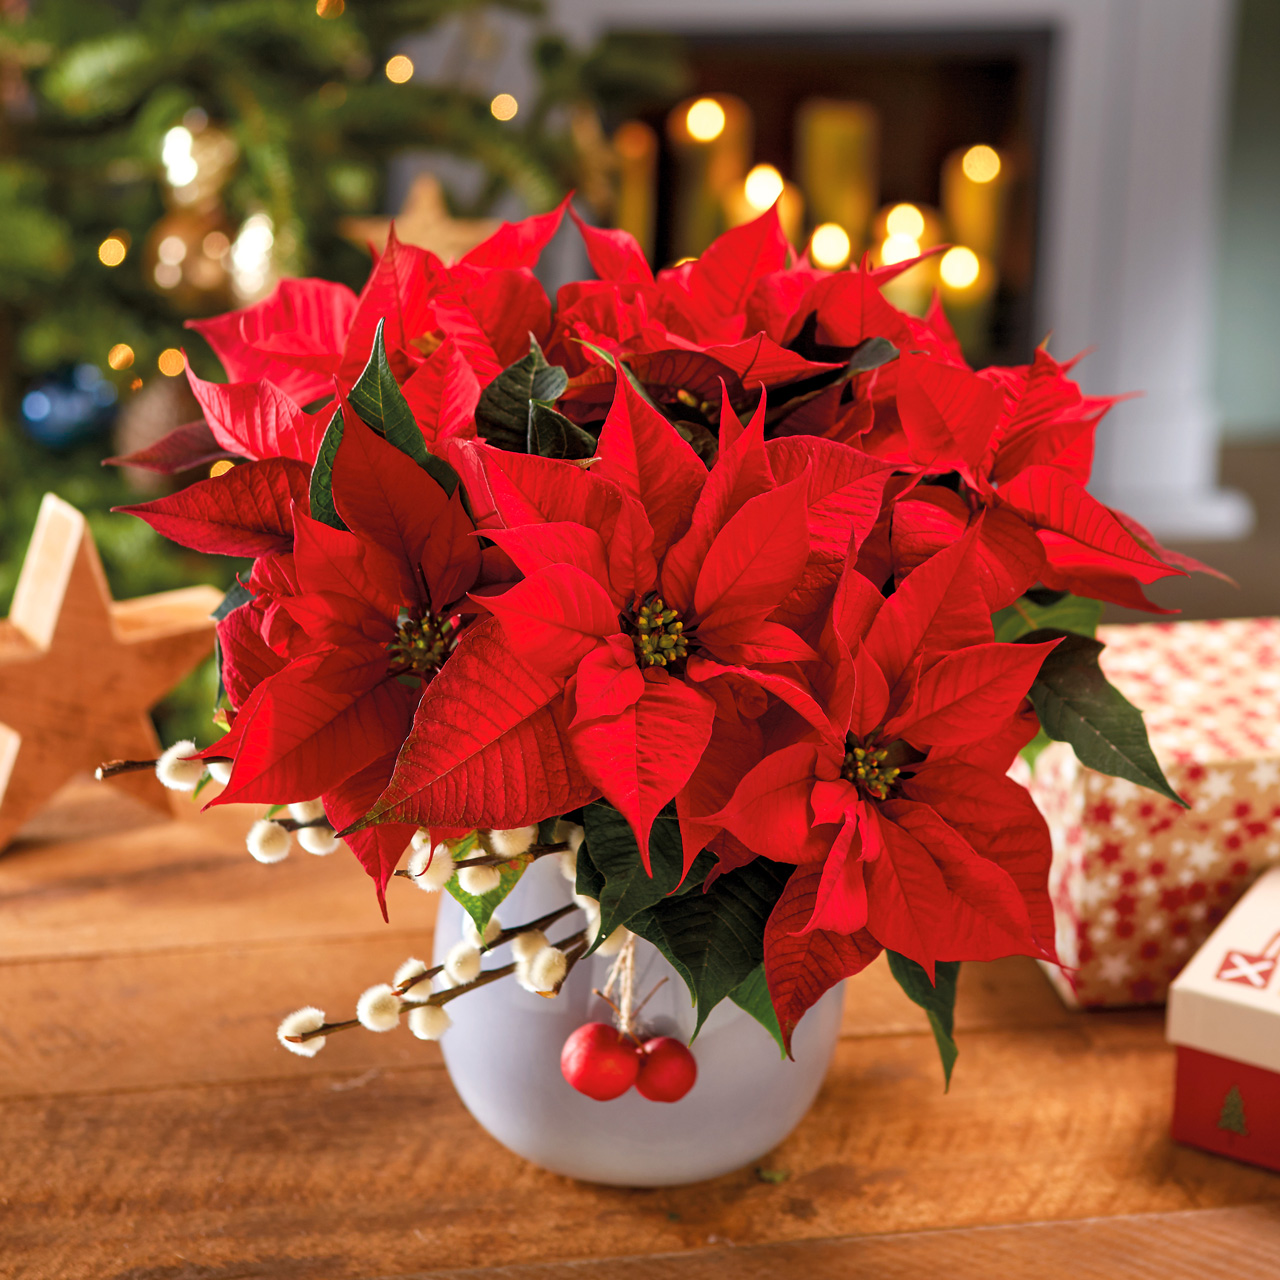 Strauß mit Weihnachtssternen in Rot by Stars for Europe